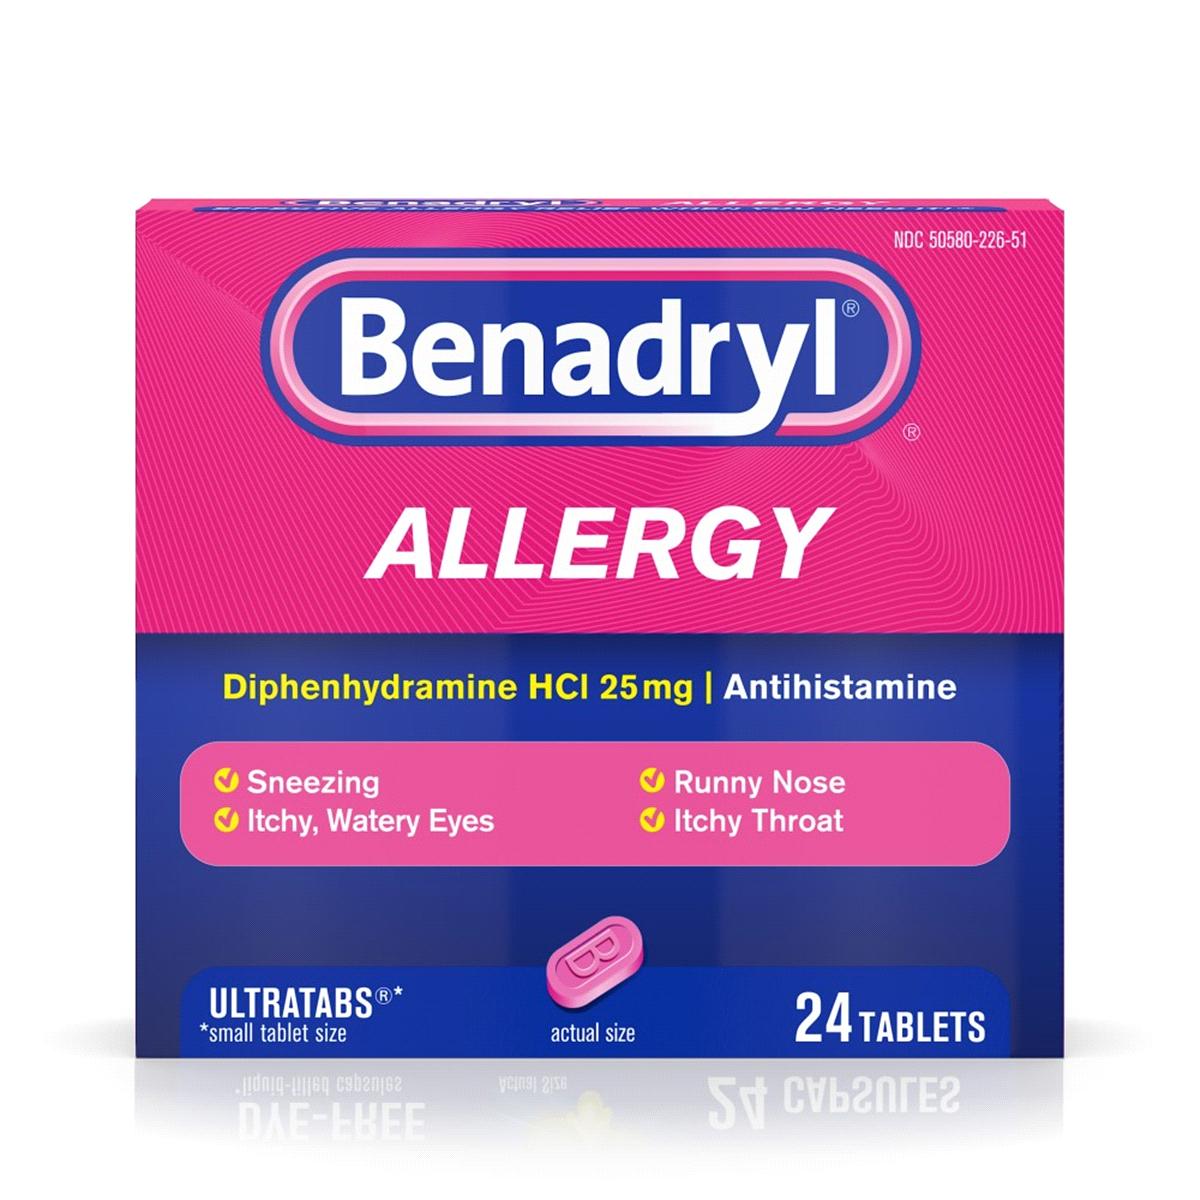 Benadryl Allergy Ultratabs Tablets, 24 Count.